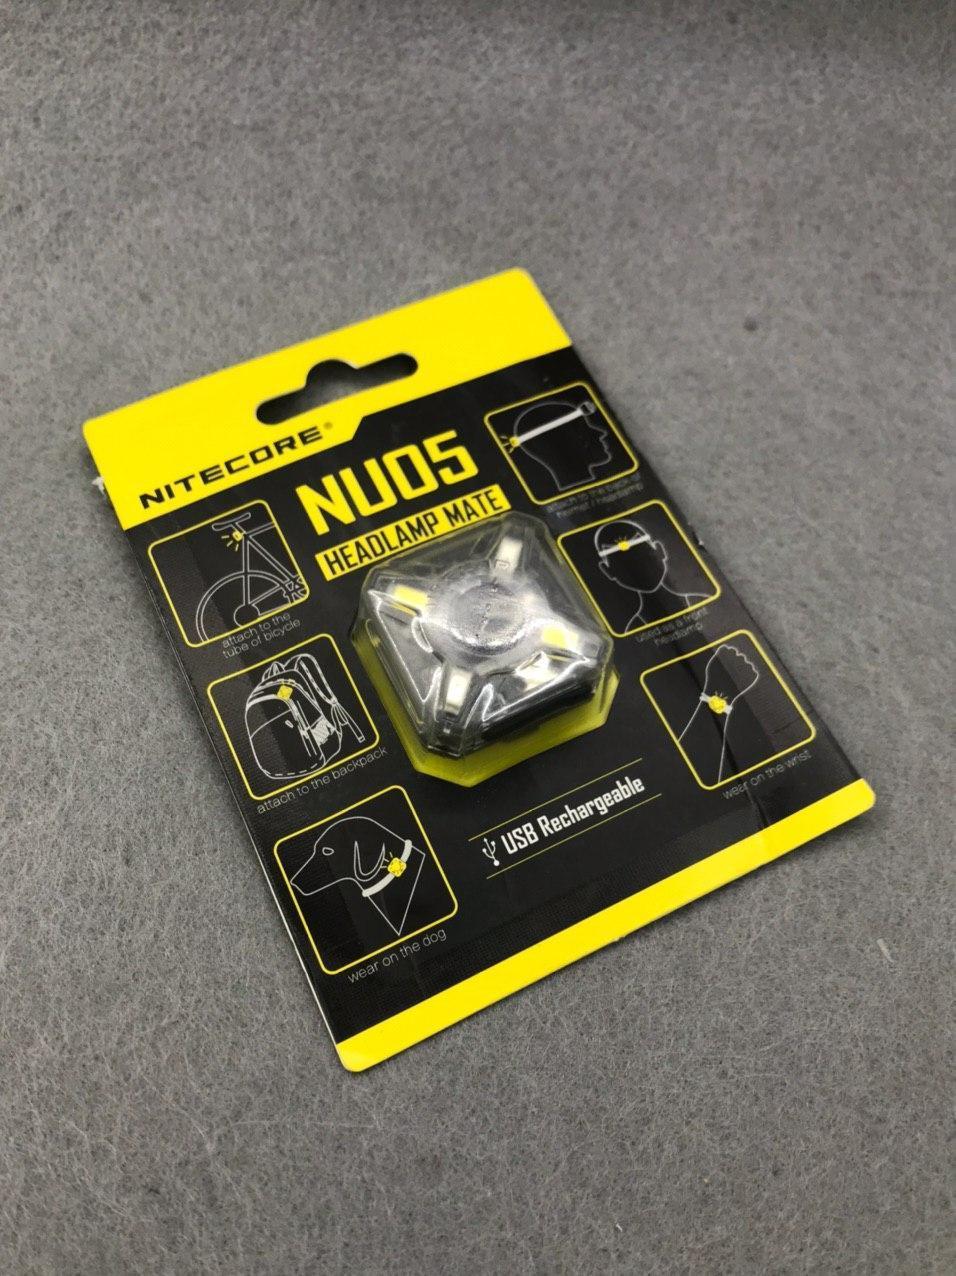 Ліхтарик Nitecore NU05 Headlamp Mate. Nu